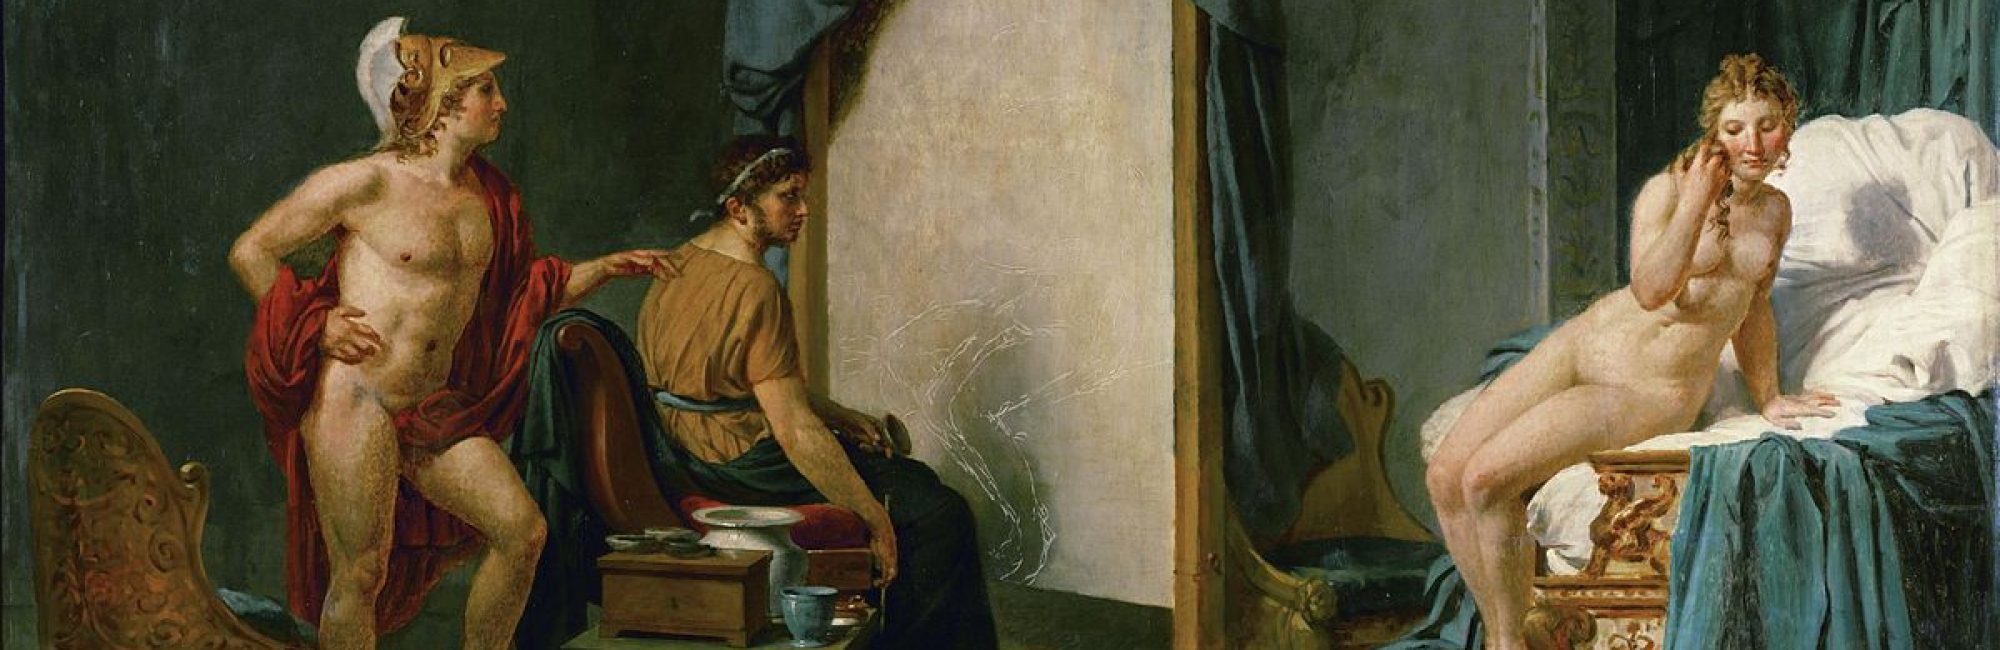 Apeles retratando a Campaspe otfkw0zchd5lkhu63o772c2fbyjgw9m7q9ss3n3kh0 - Expansión de Macedonia: Filipo II y Alejandro Magno